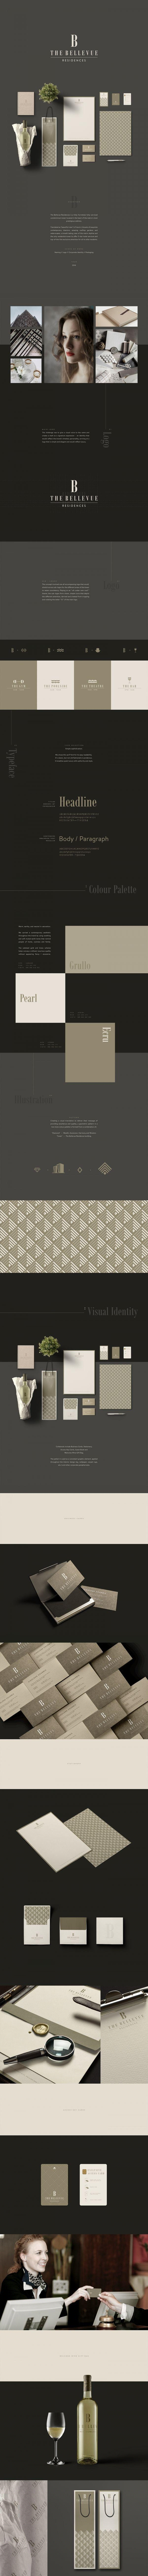 The Bellevue Residences Brand Identity Design